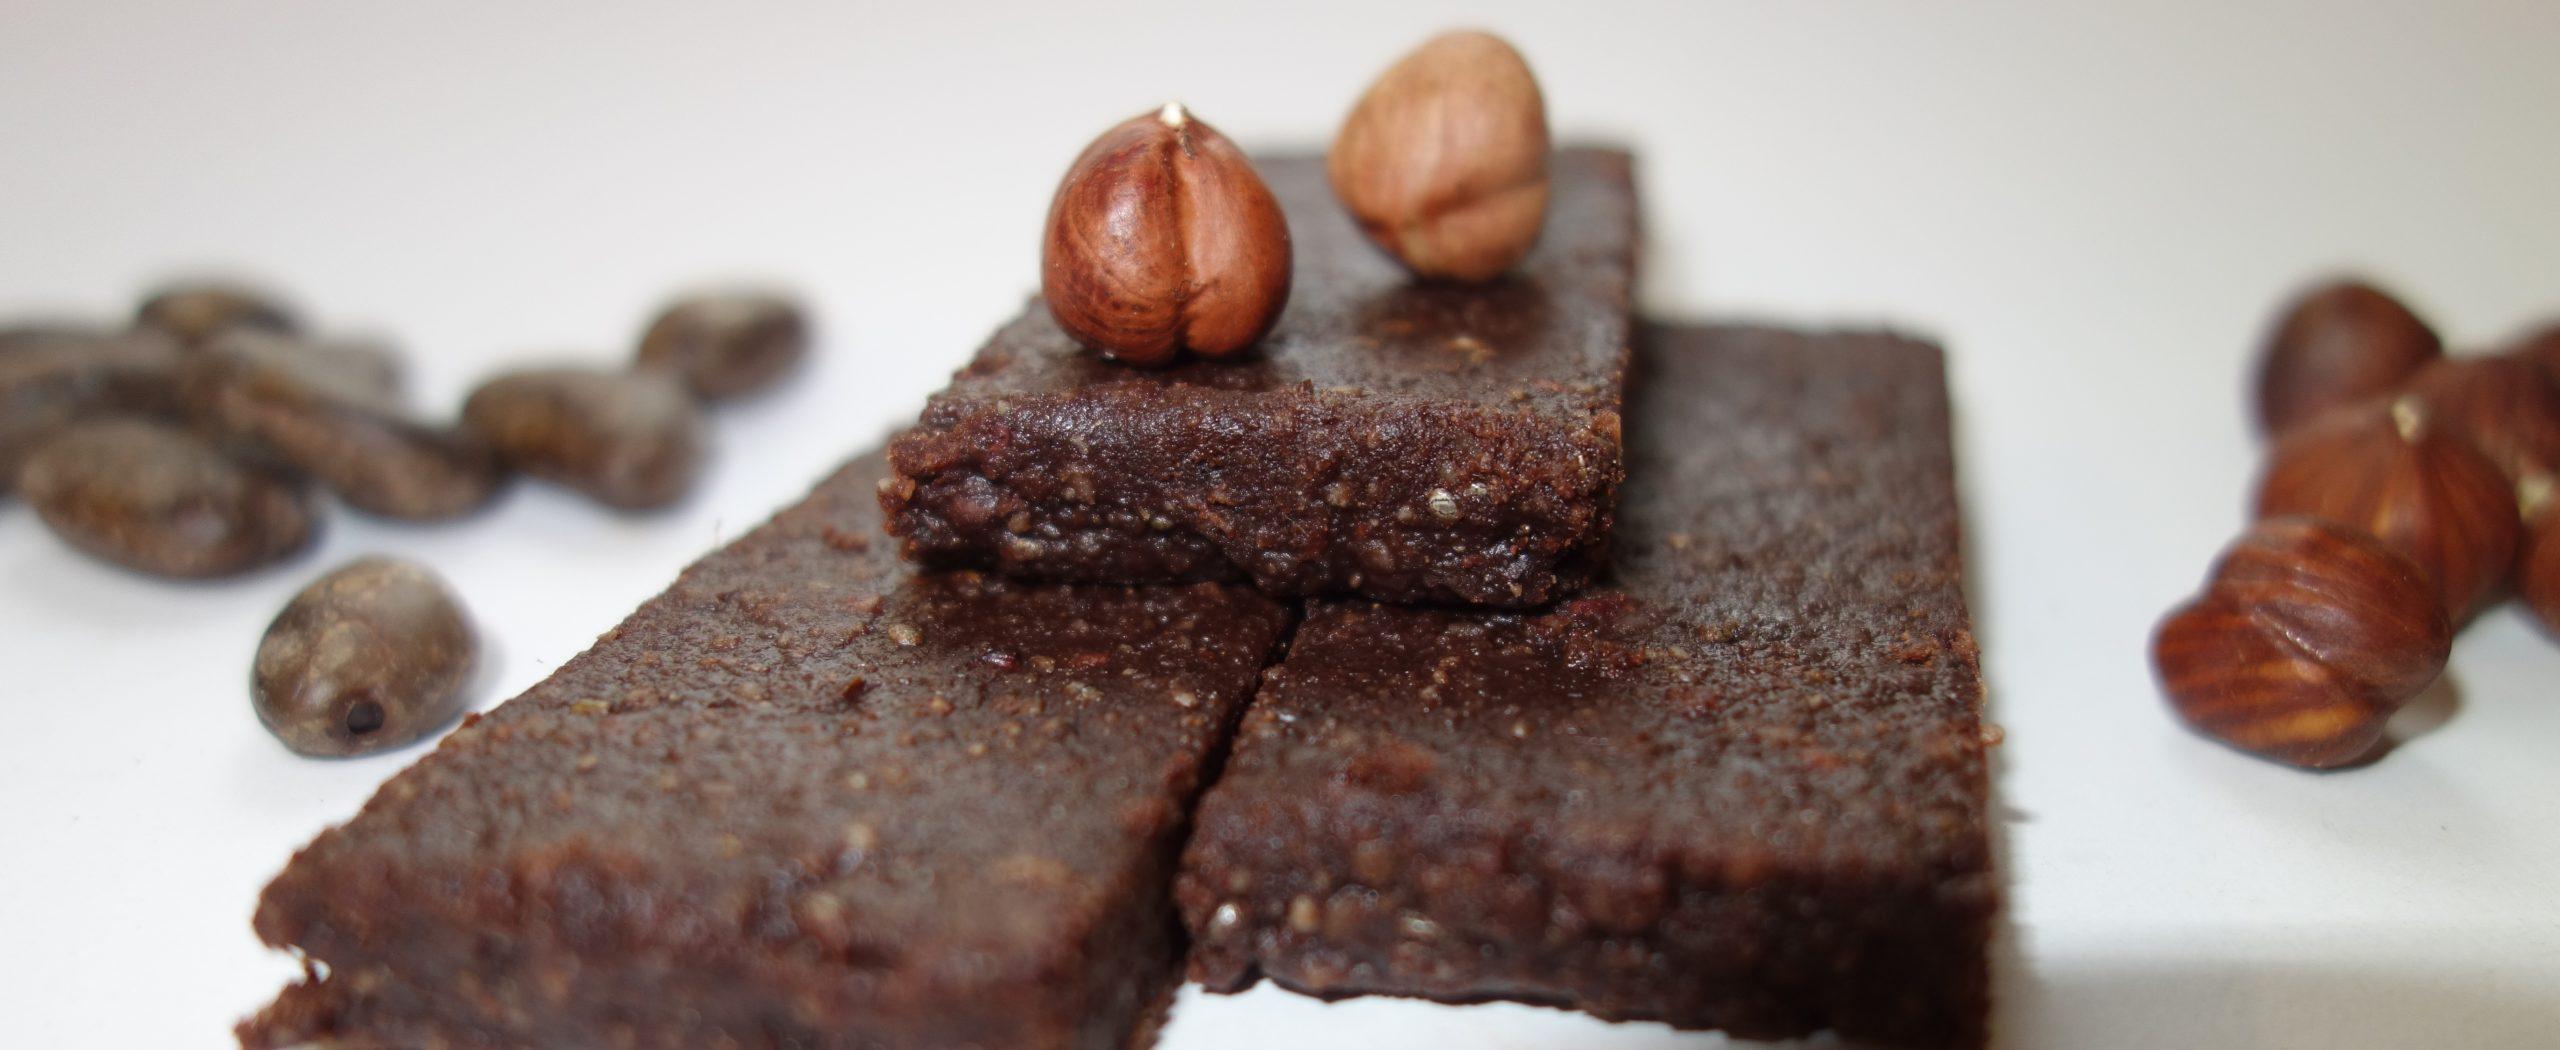 Haselnuss-Kakao-Riegel